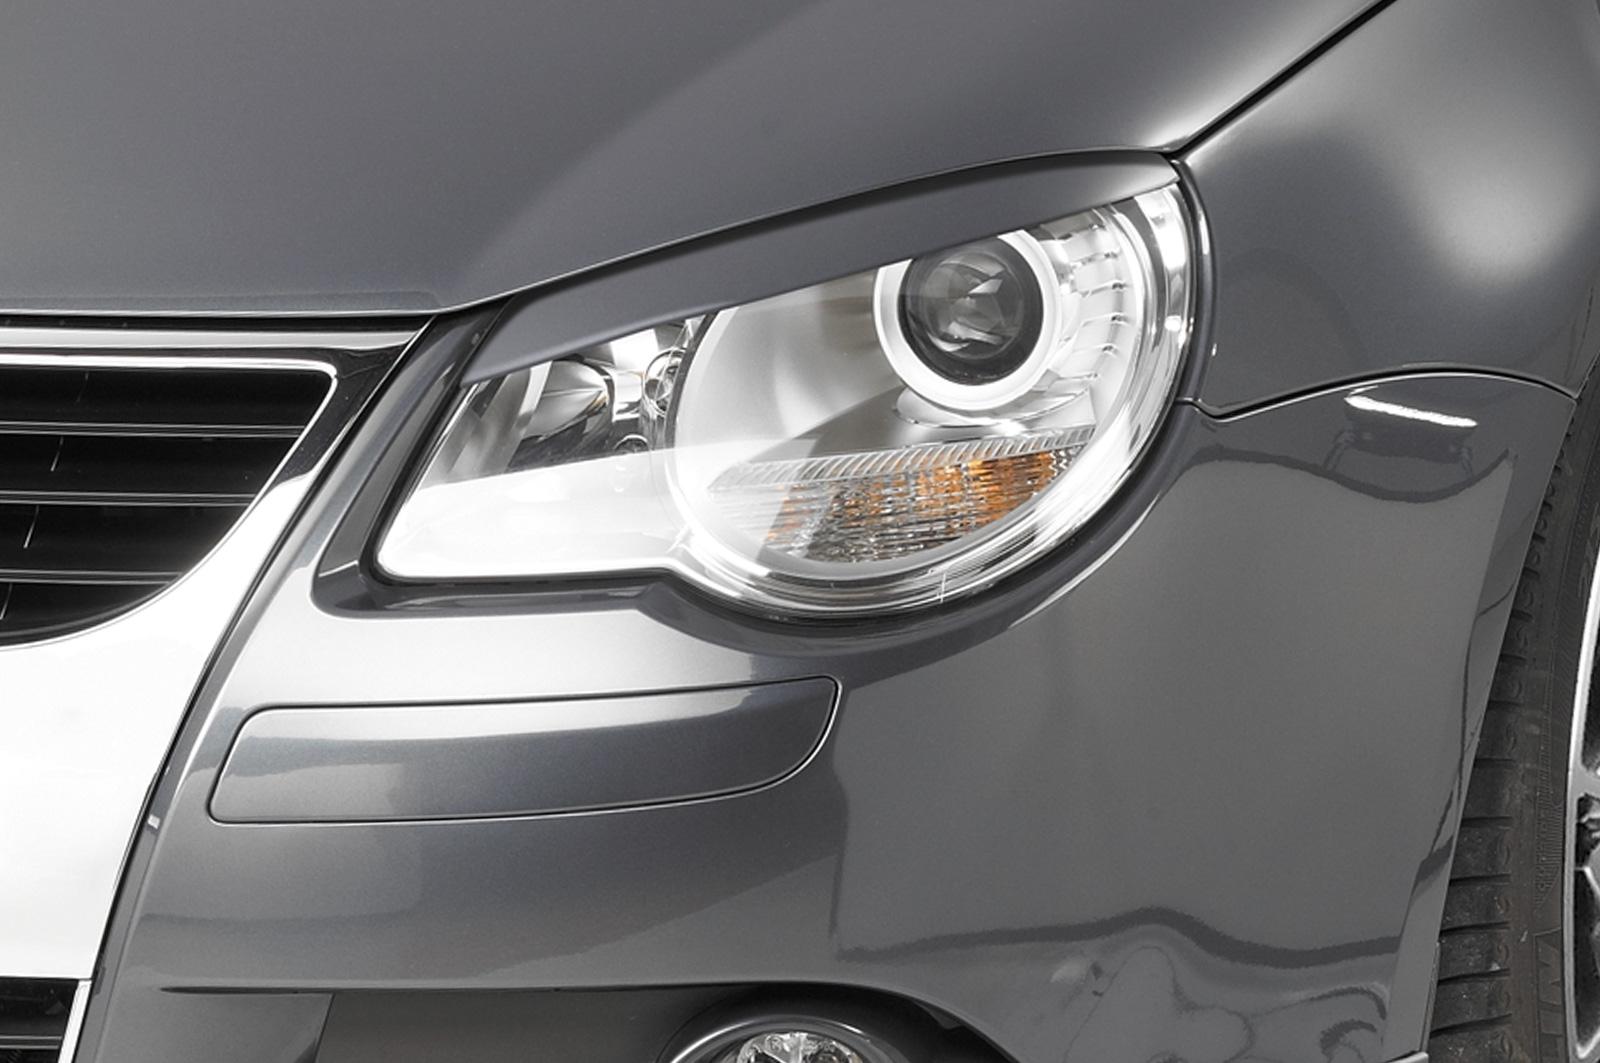 VW Eos (06-10) Headlight Brows - ABS